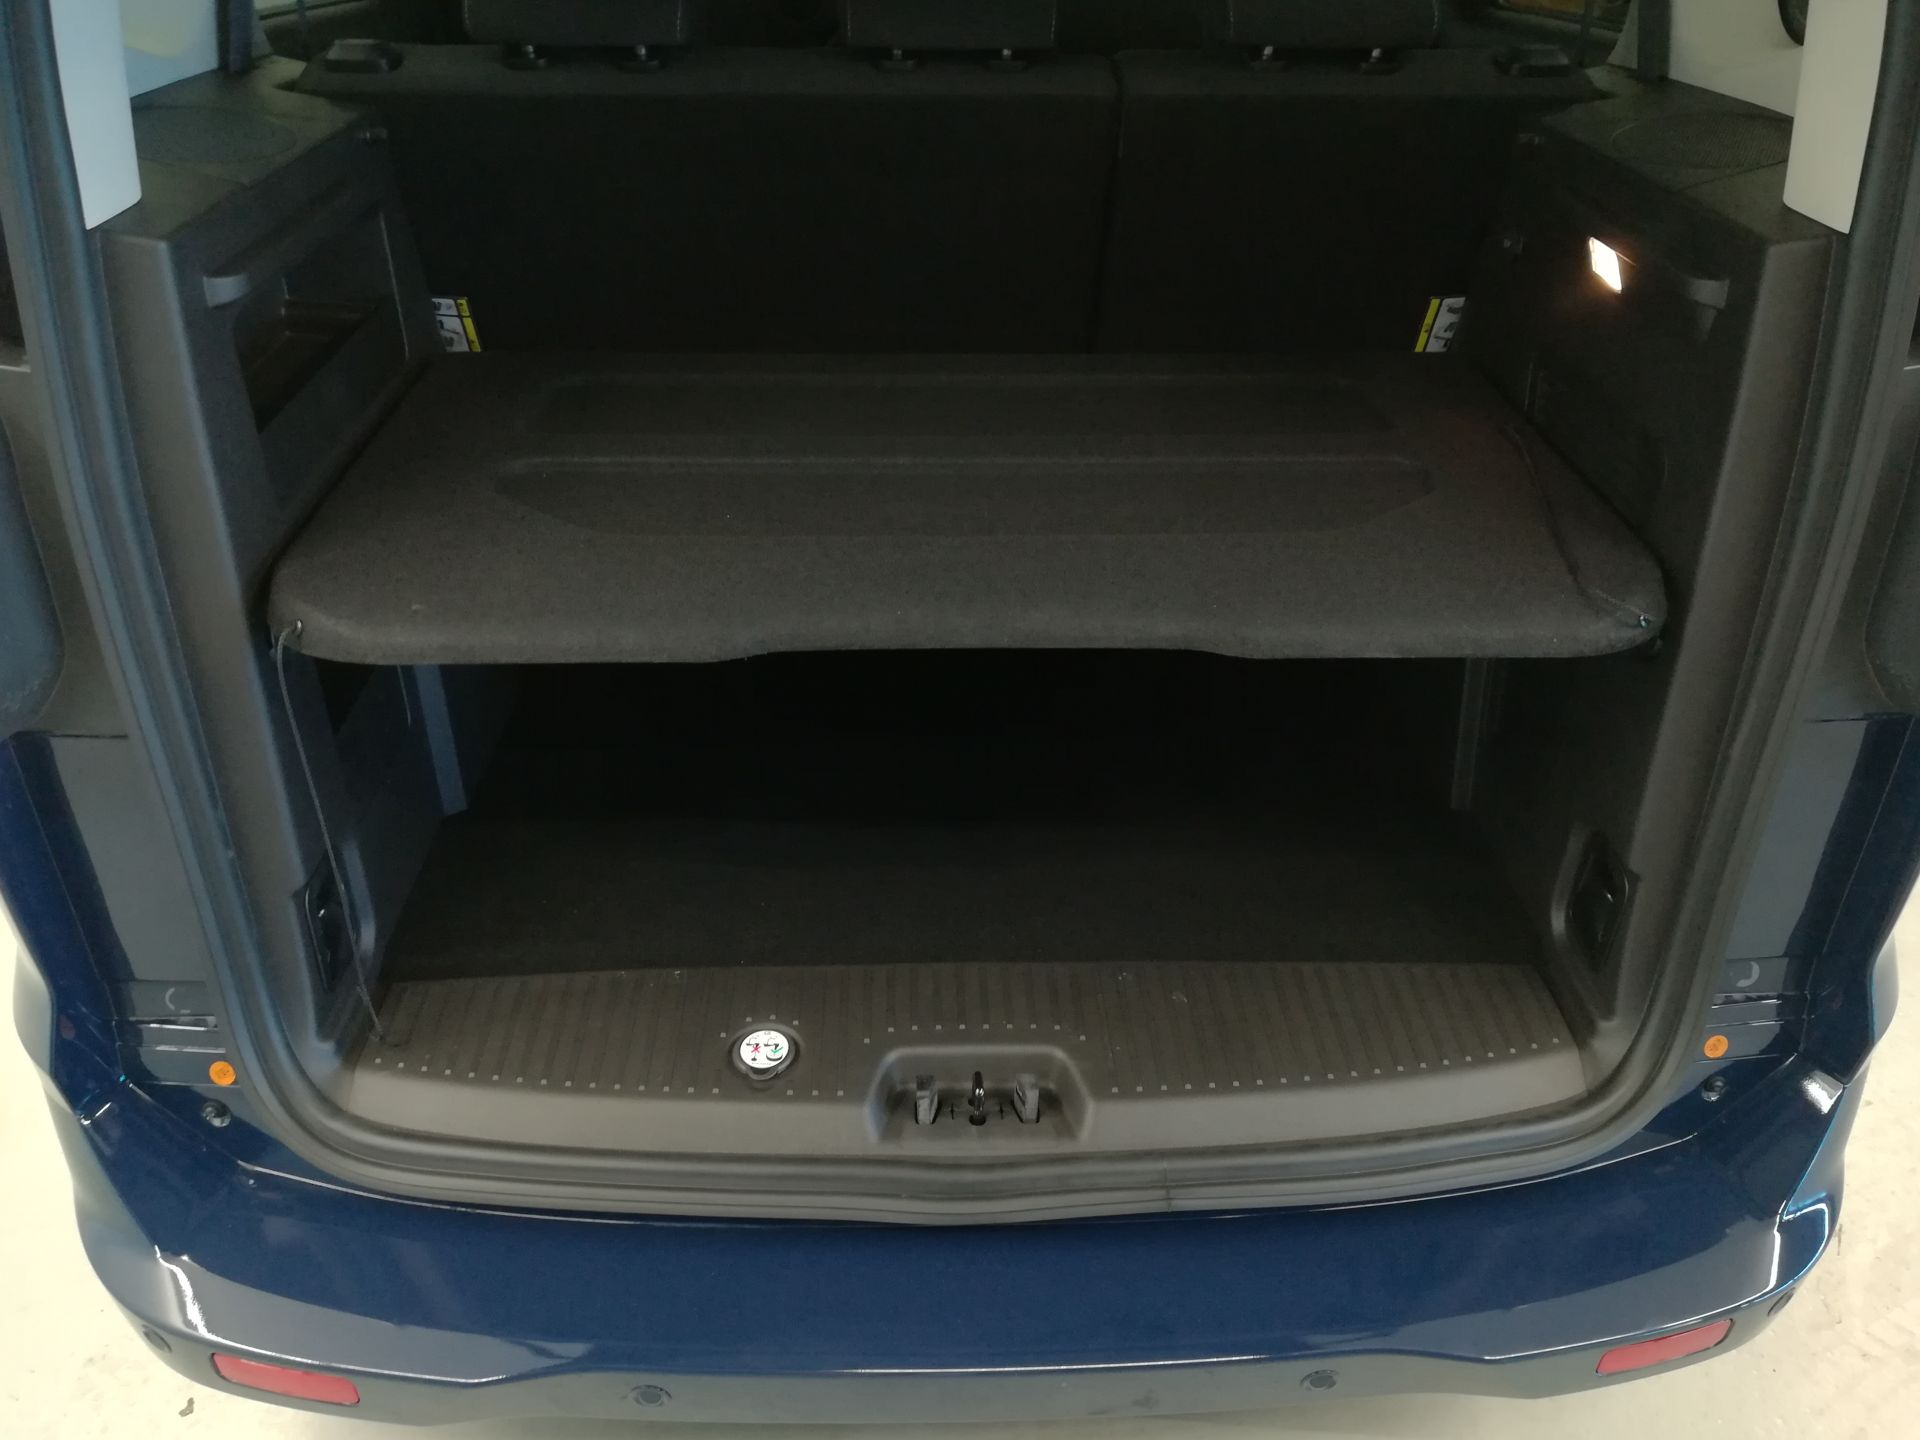 Ford Tourneo Courier 1.5 TDCi 74kW (100CV) Titanium